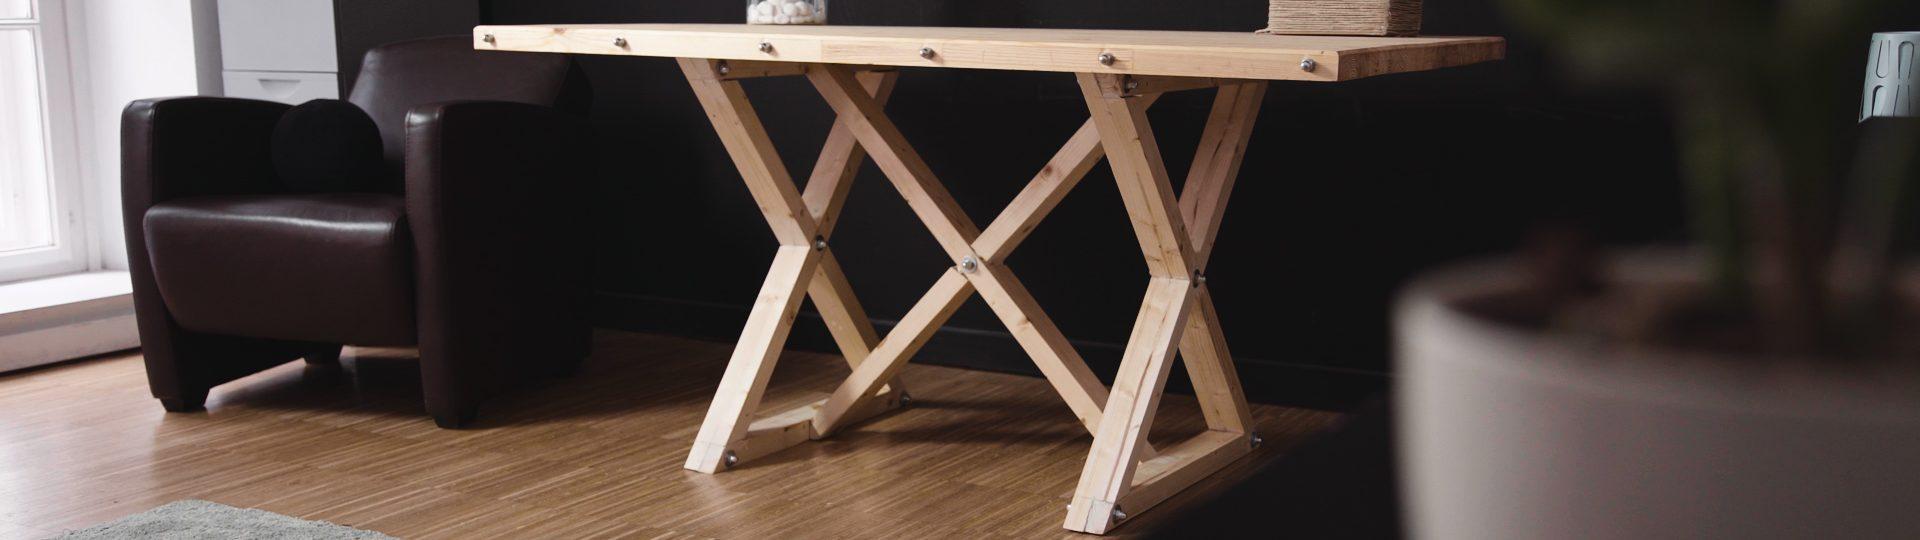 fa-asztal